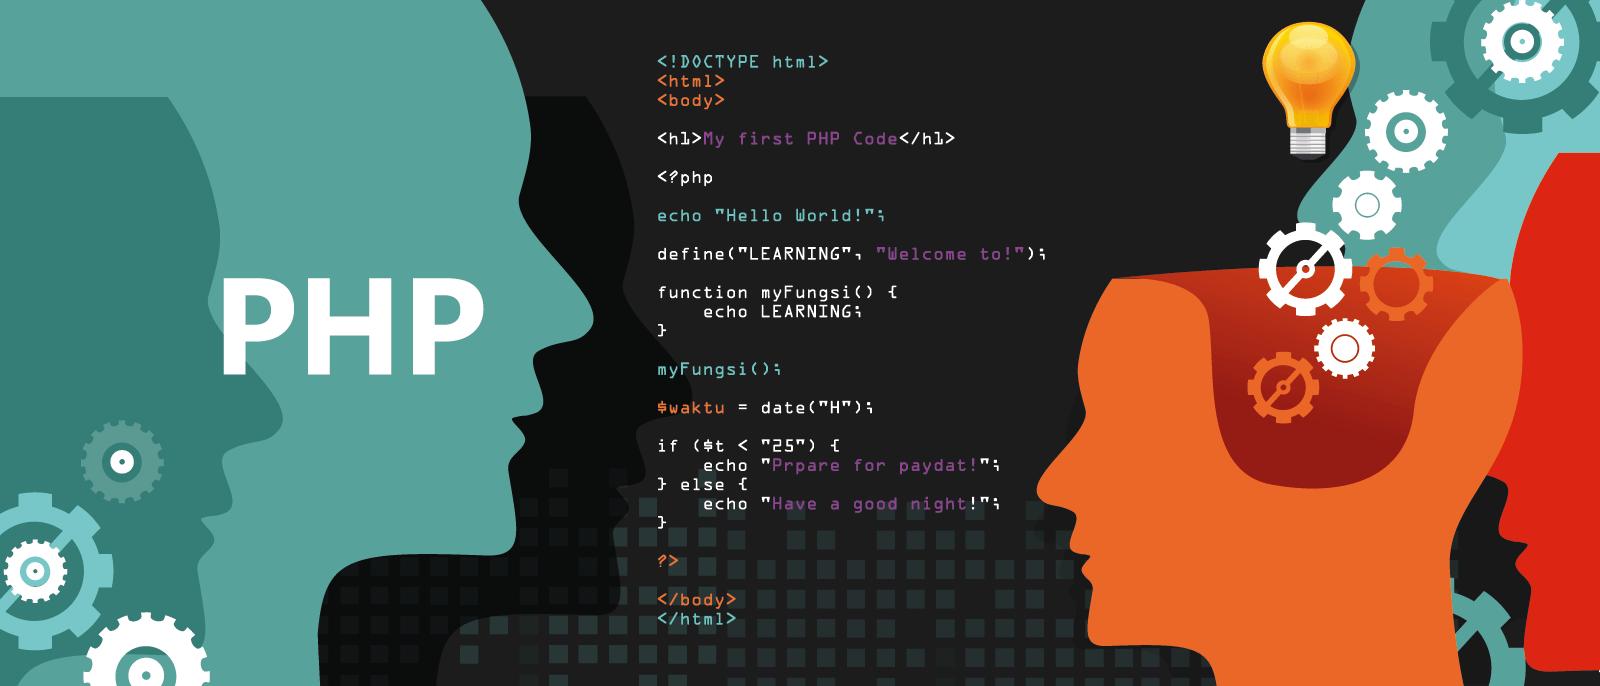 php-webentwickler-jobs_2017_b1